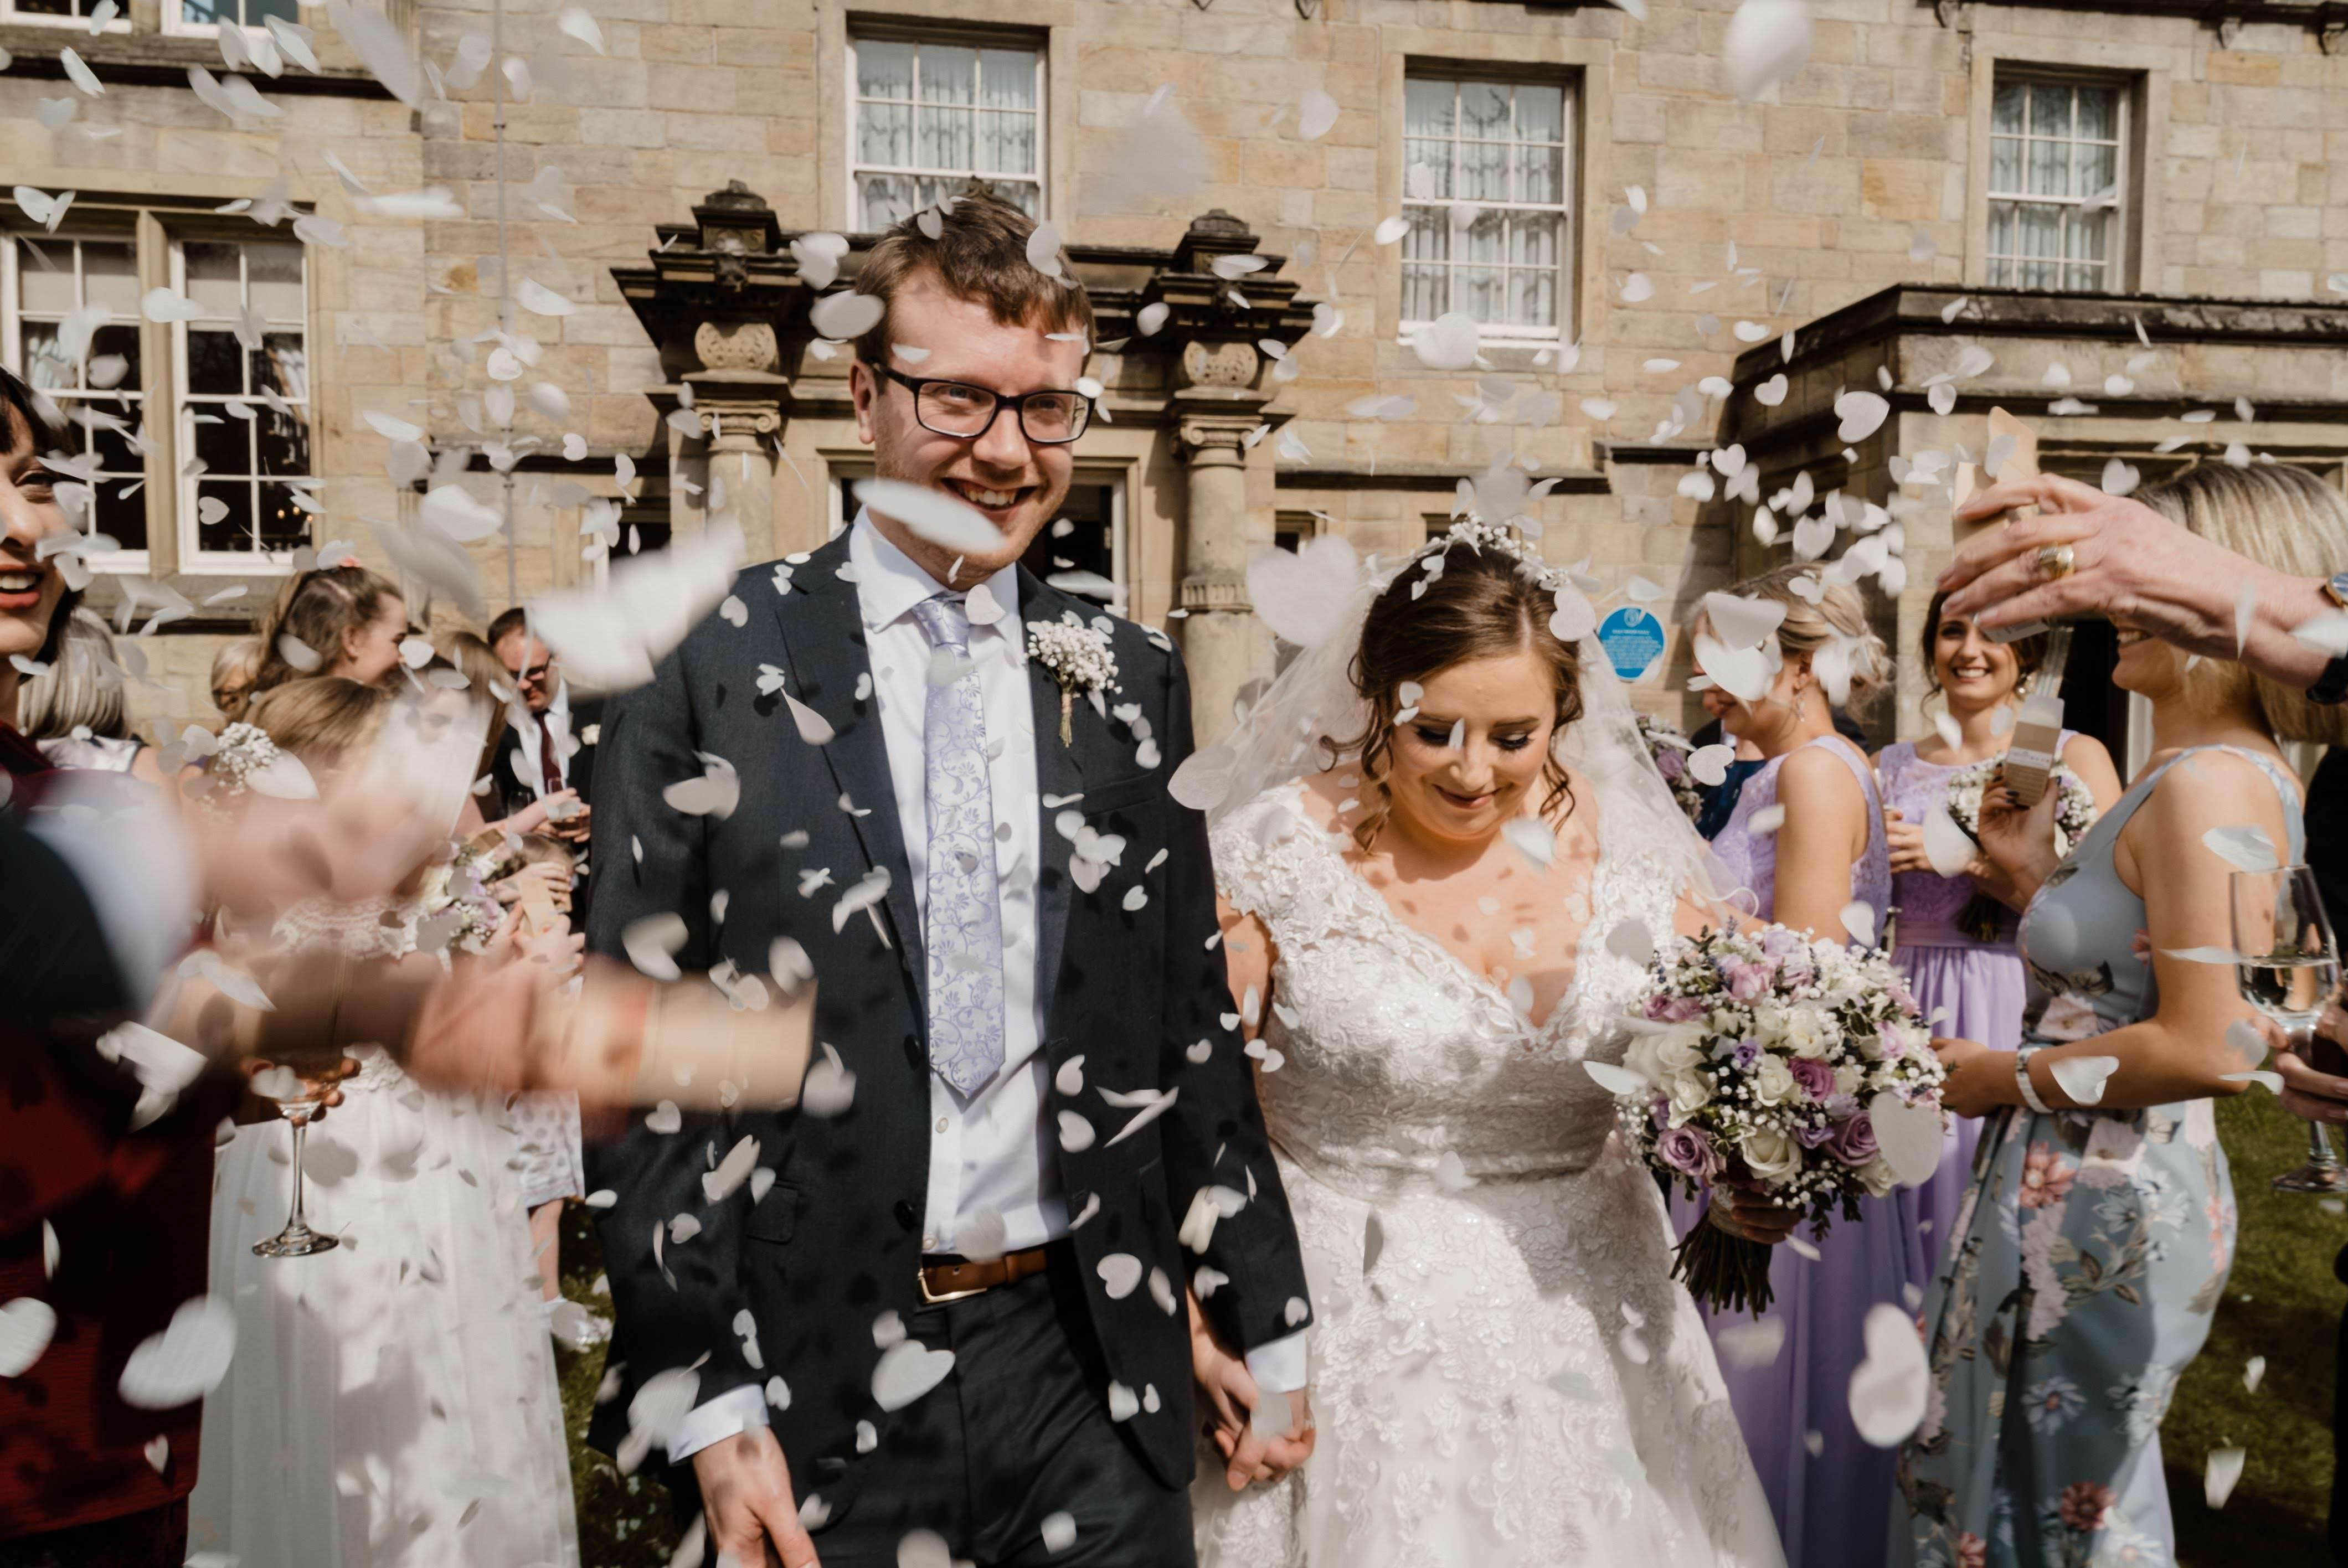 Husbadn and Bride Confetti Shot . - Weetwood Hall Wedding